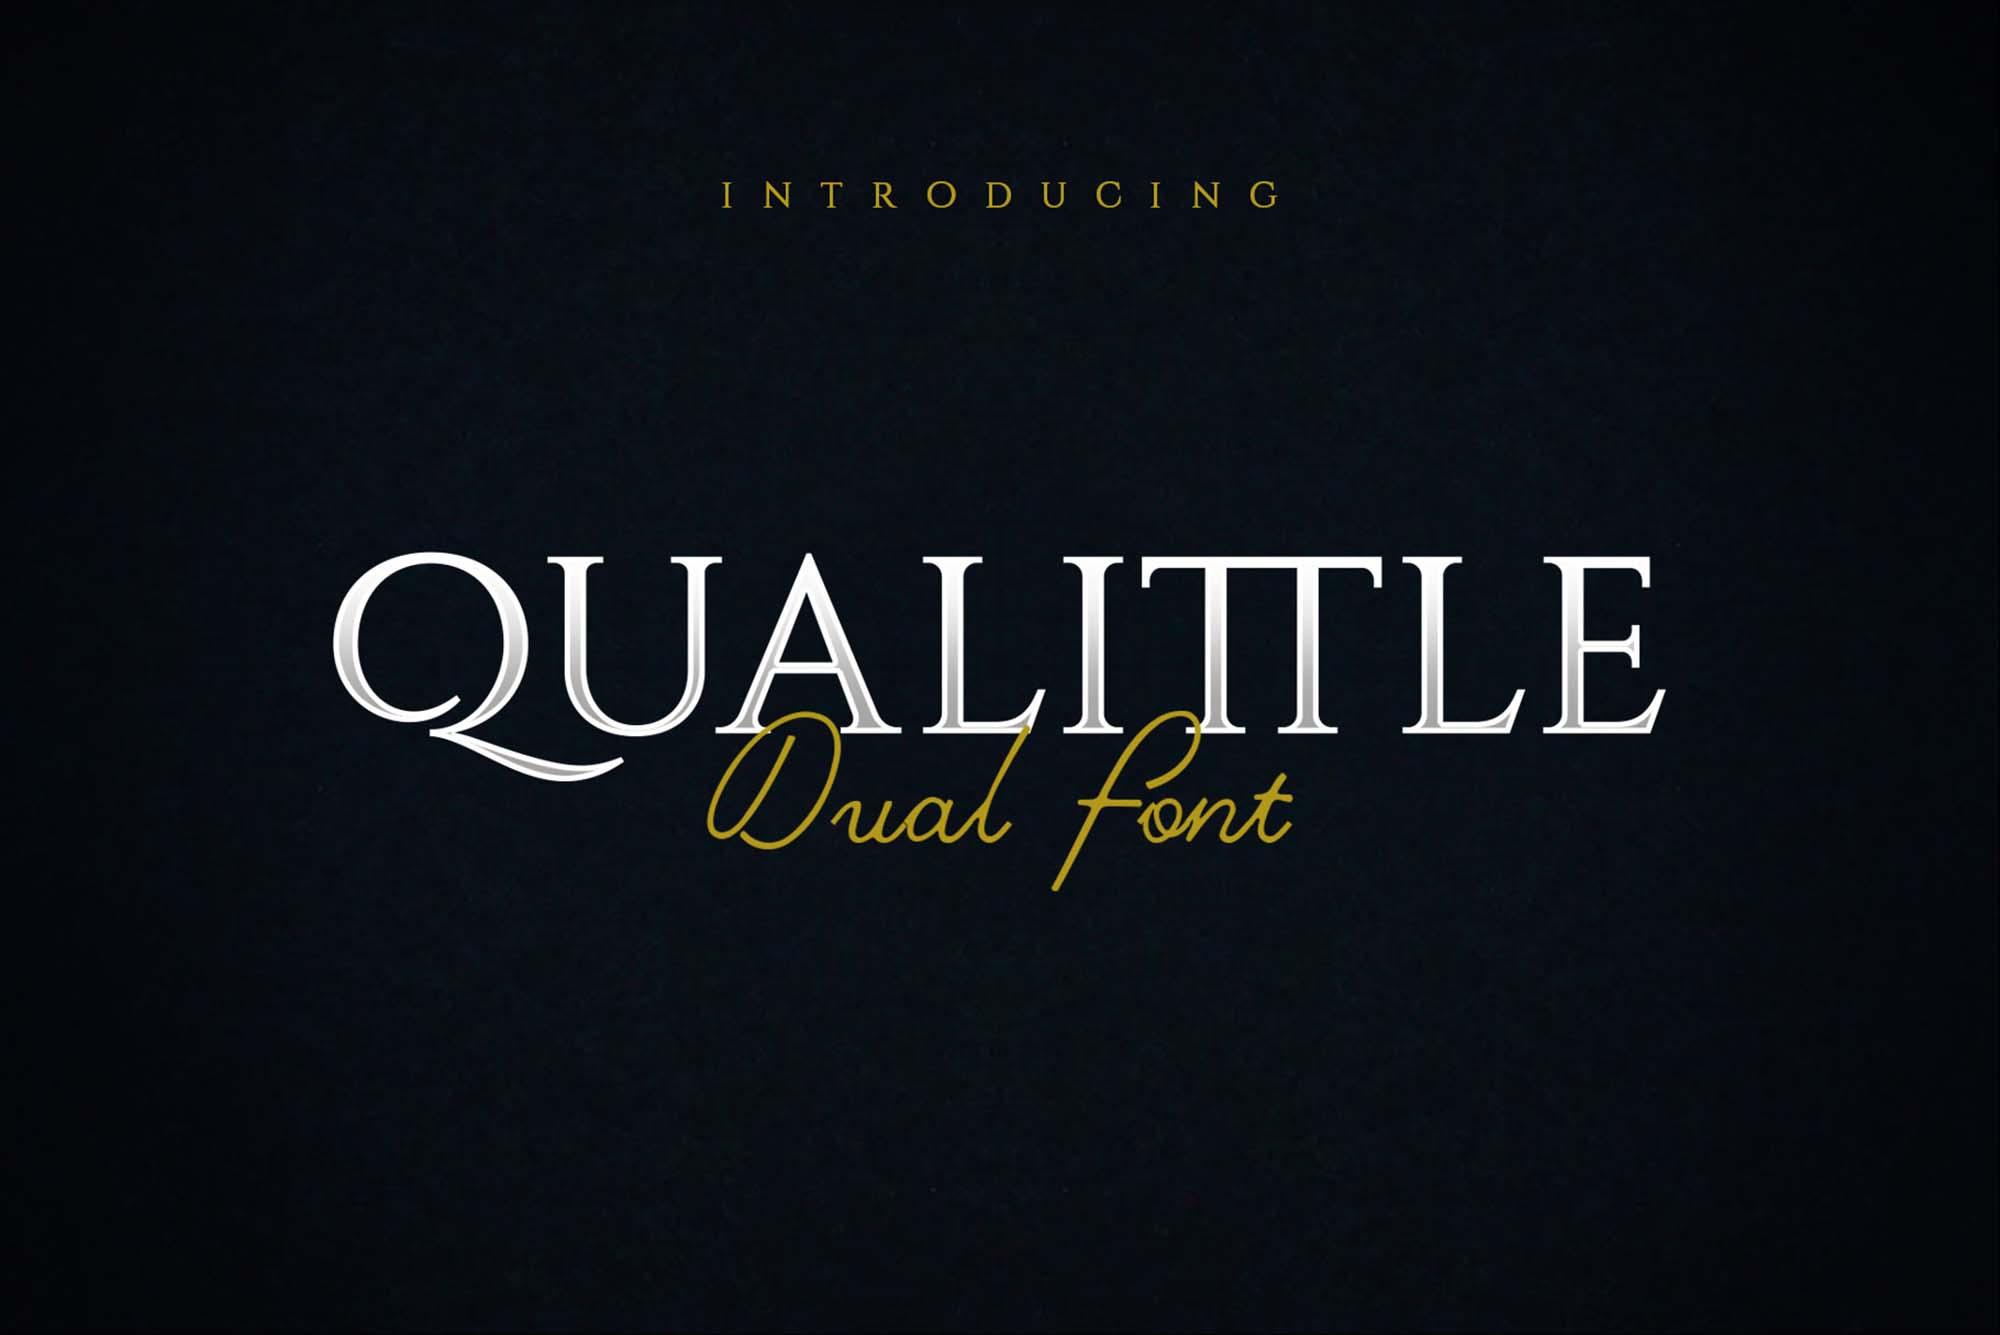 Qualittle Dual Font